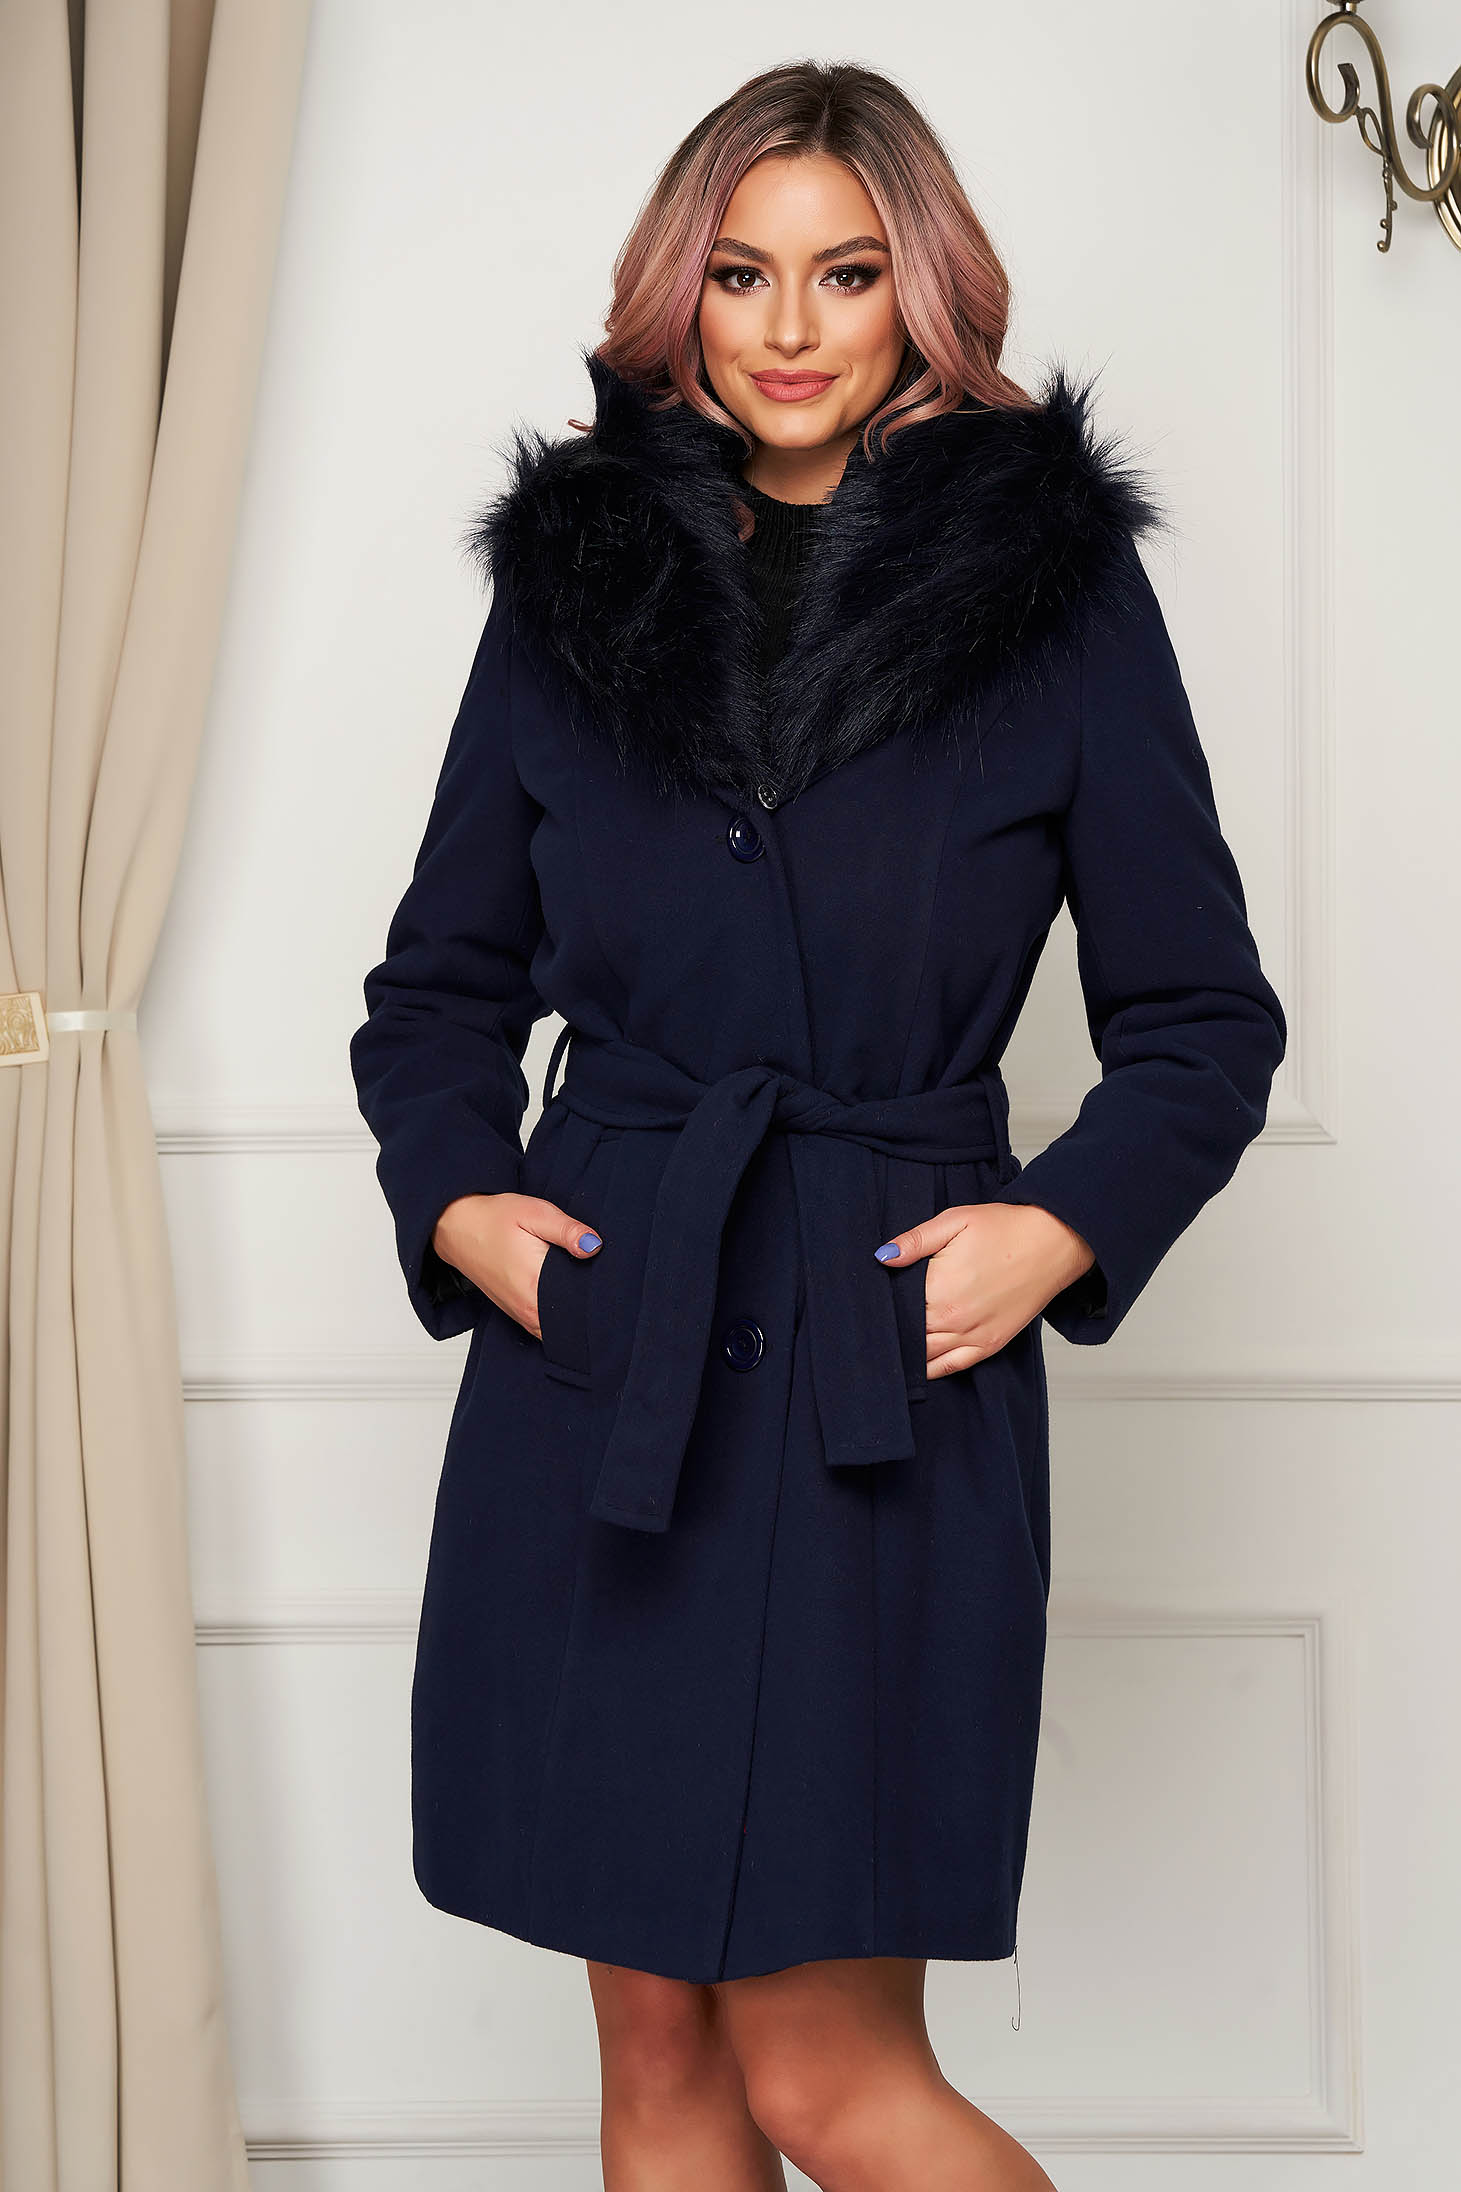 Darkblue coat wool straight elegant fur collar accessorized with tied waistband